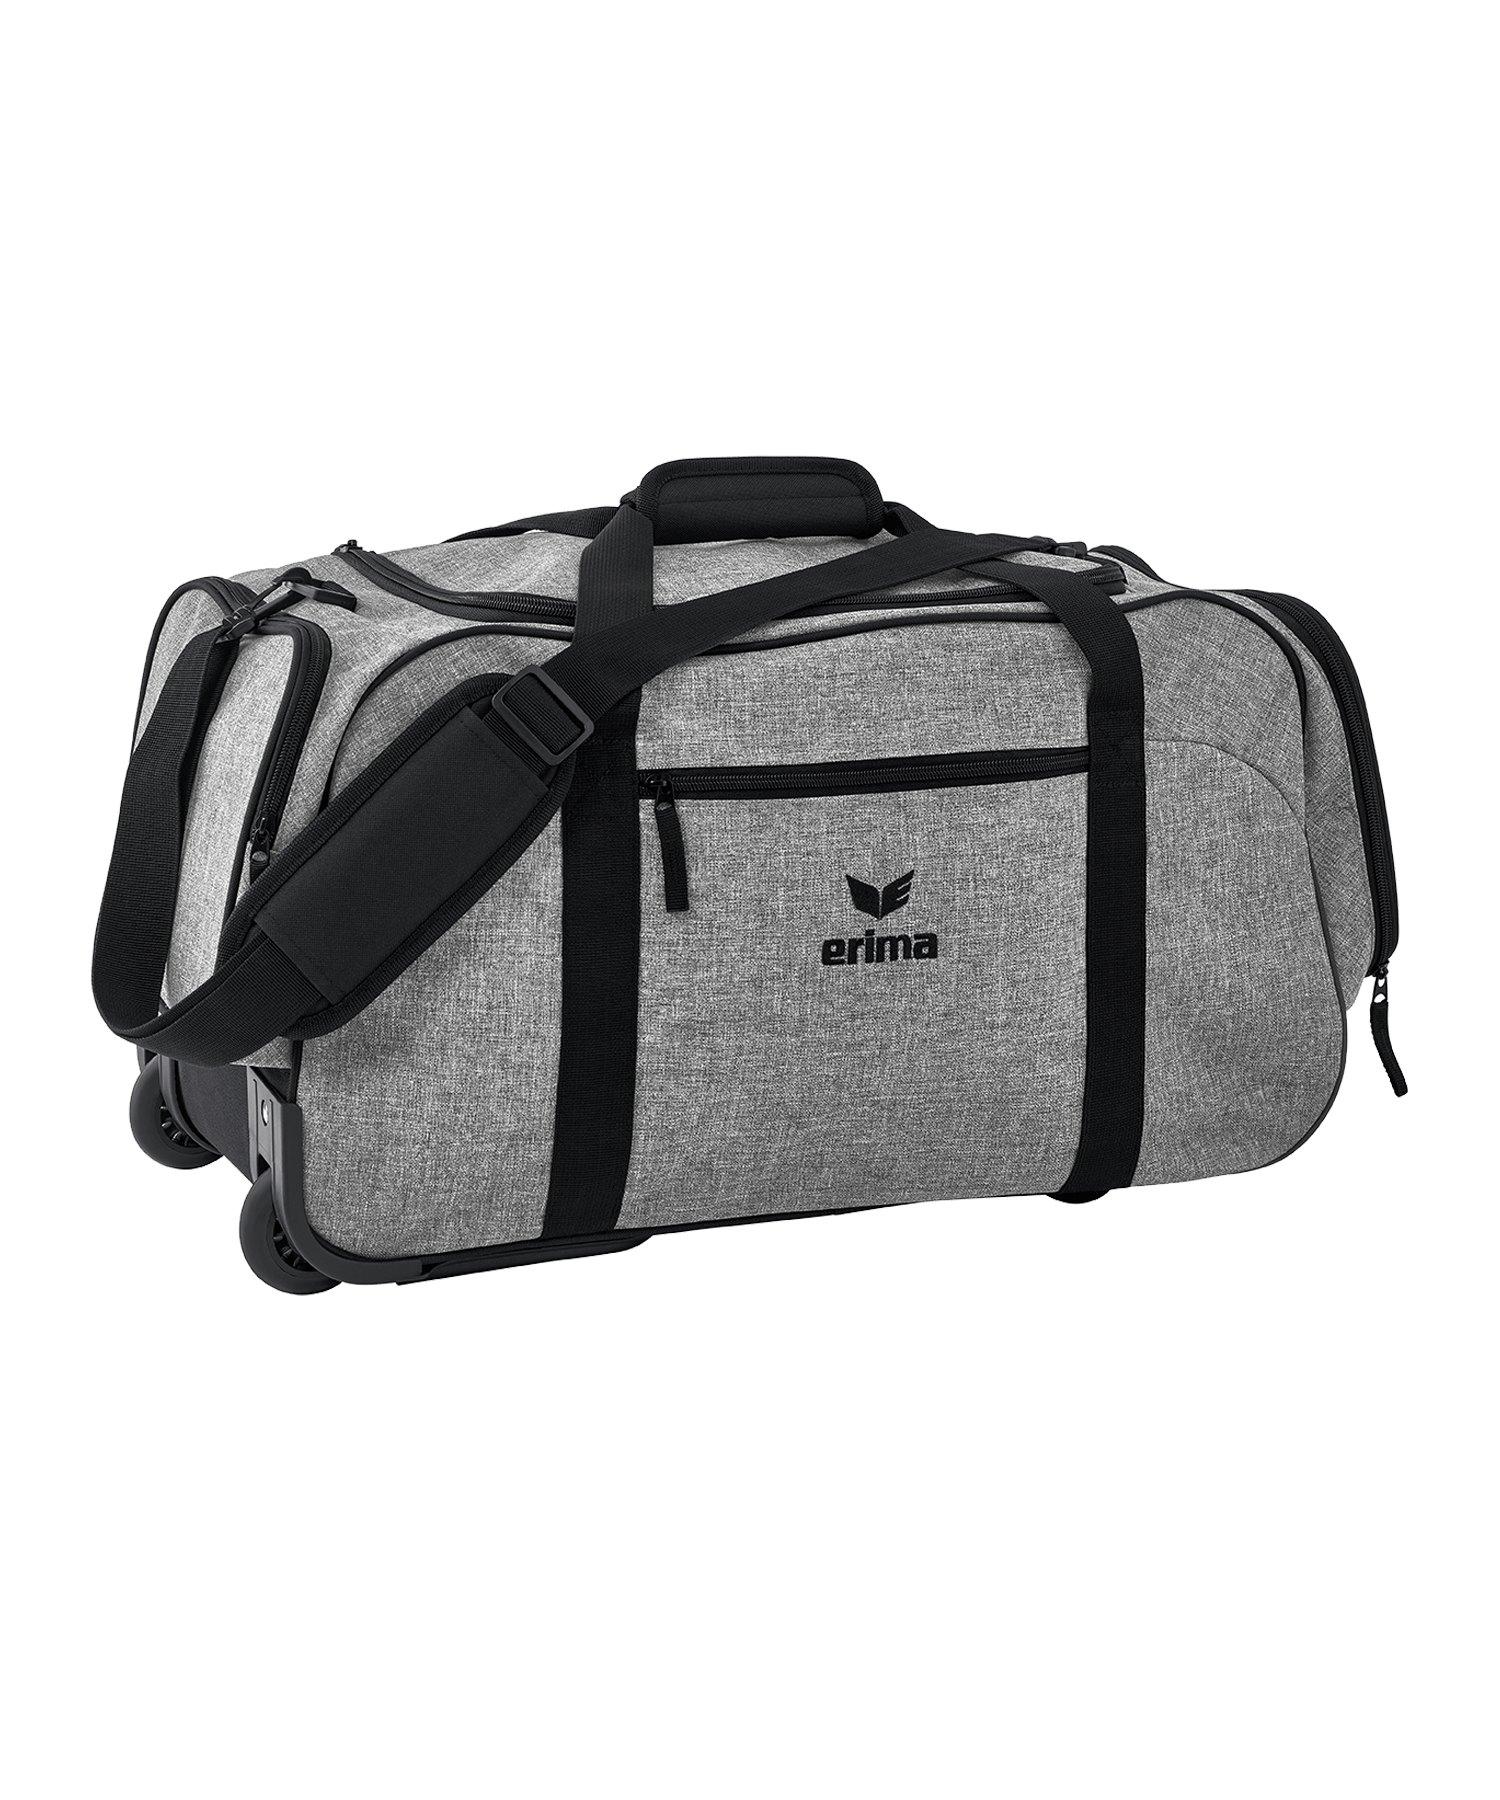 Erima Sportsbag Sporttasche Größe M Grau Schwarz - grau